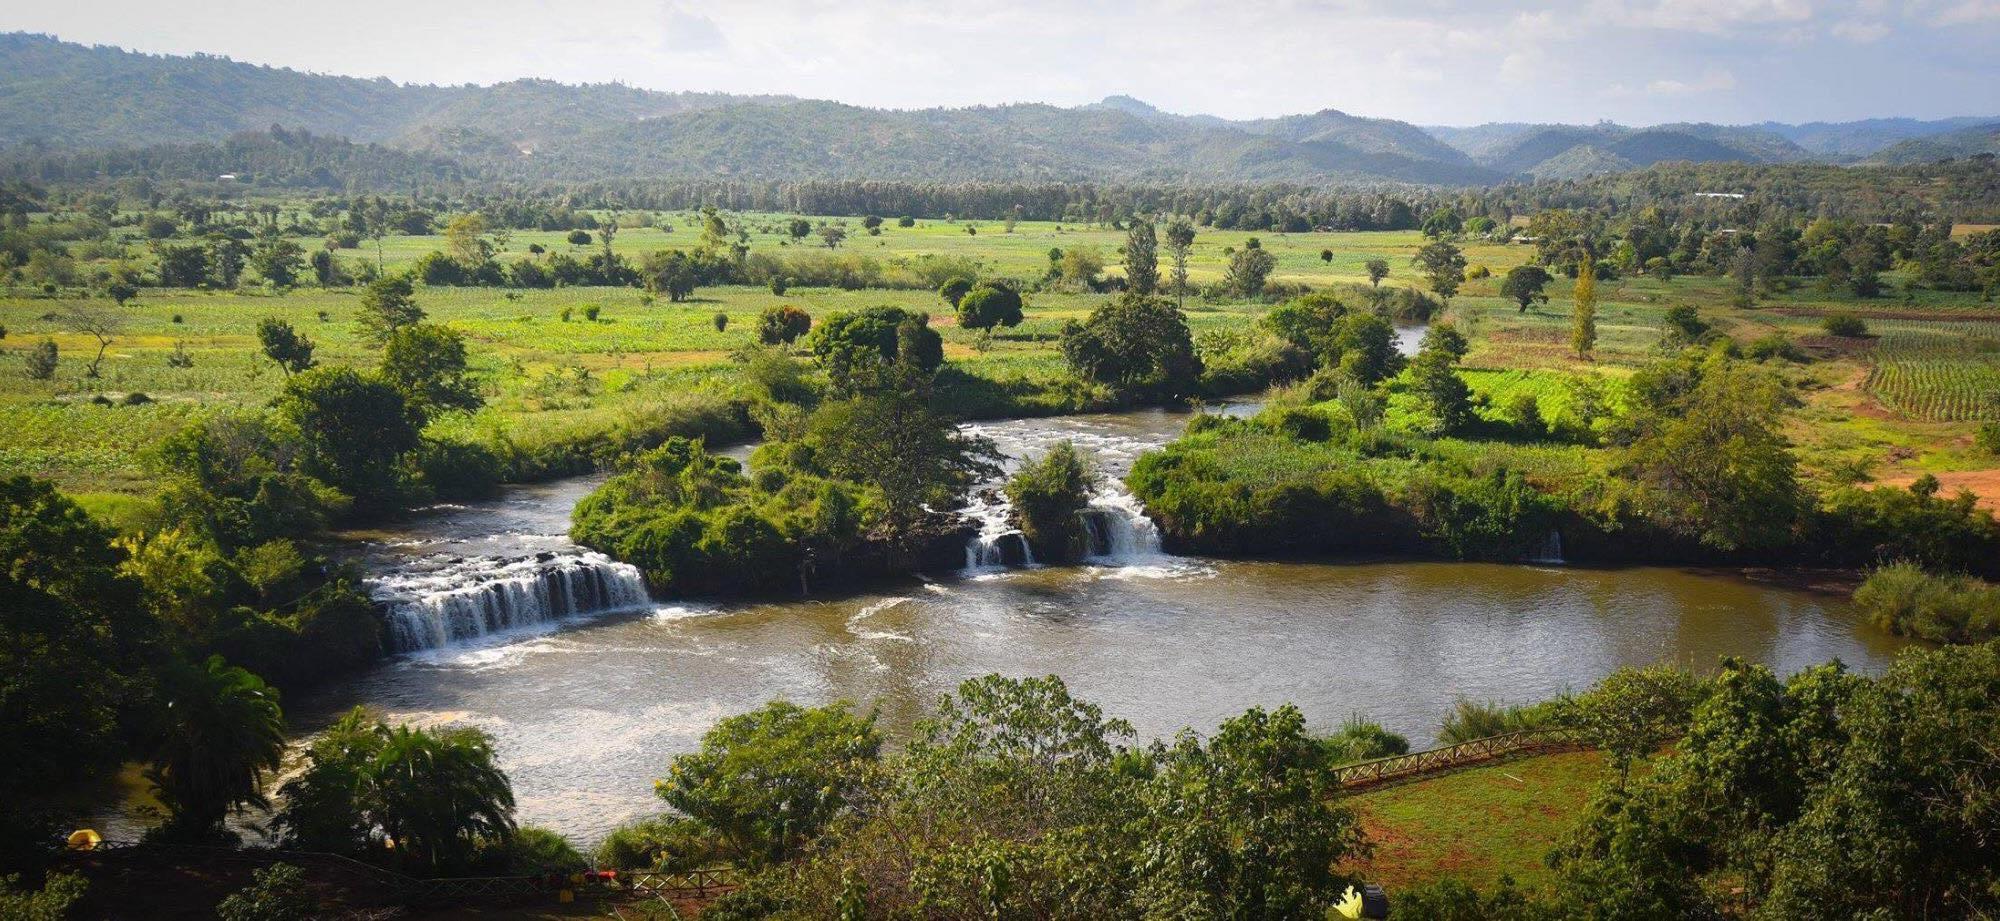 Domestic tourism in Kenya